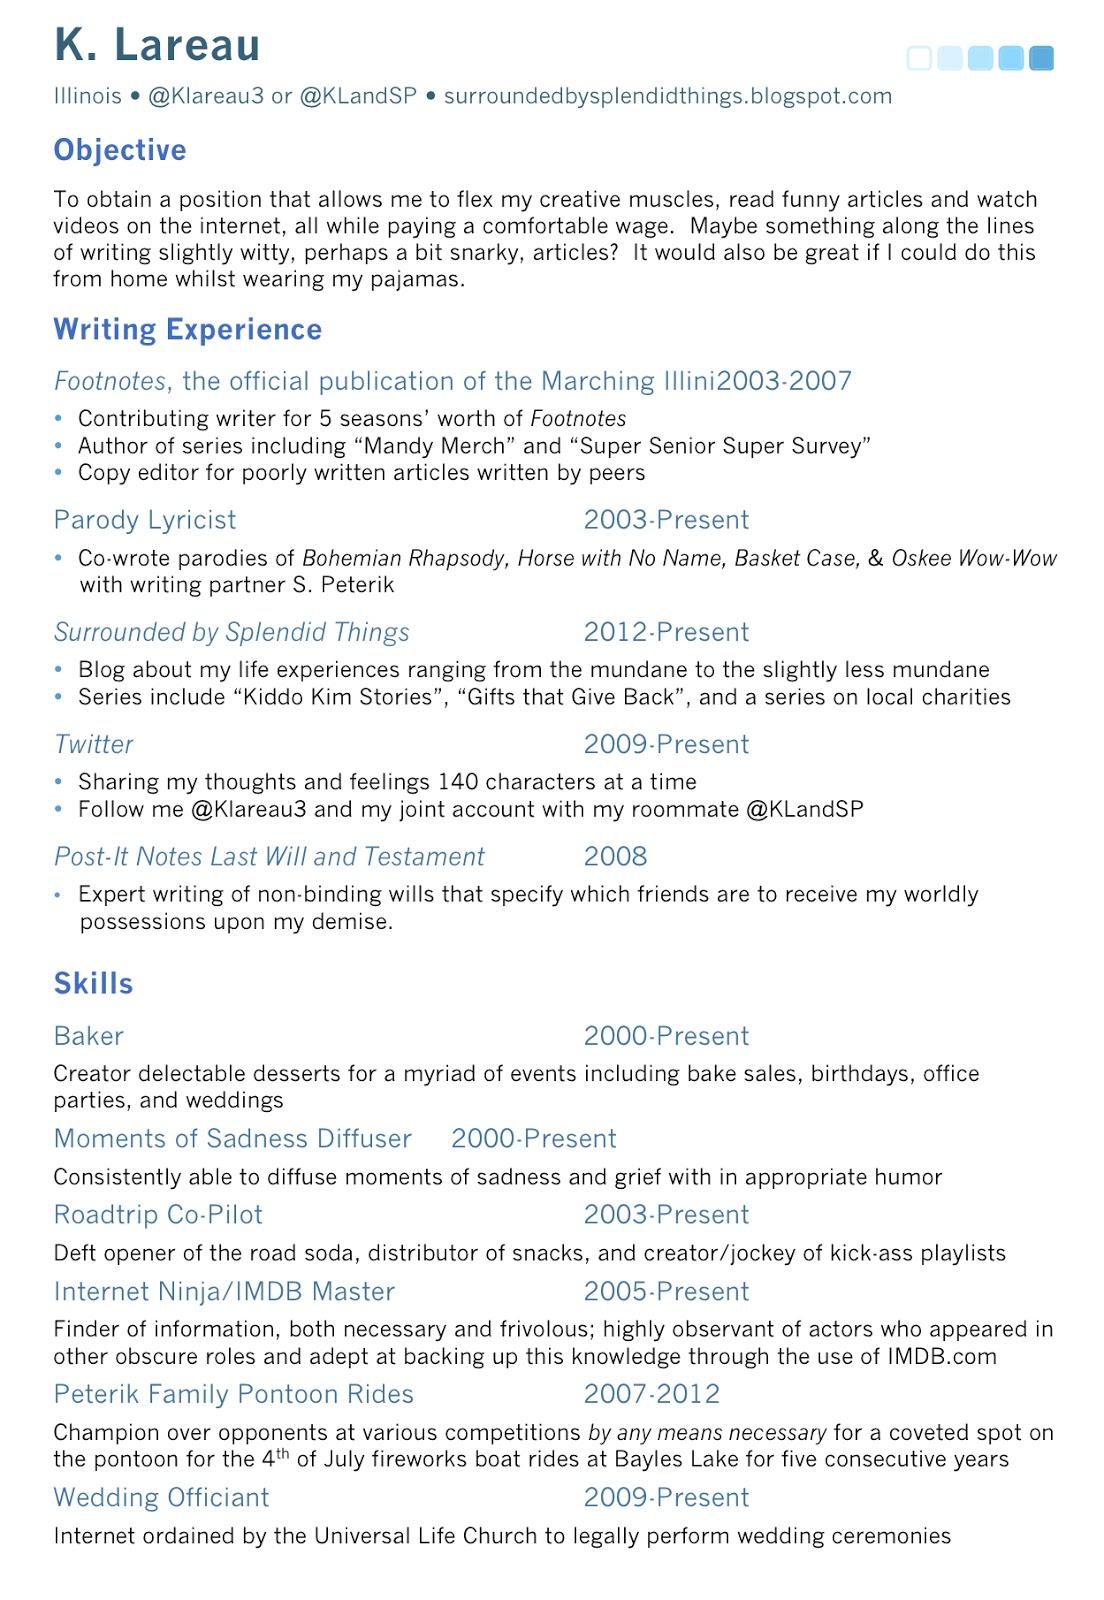 resume playbestonlinegames